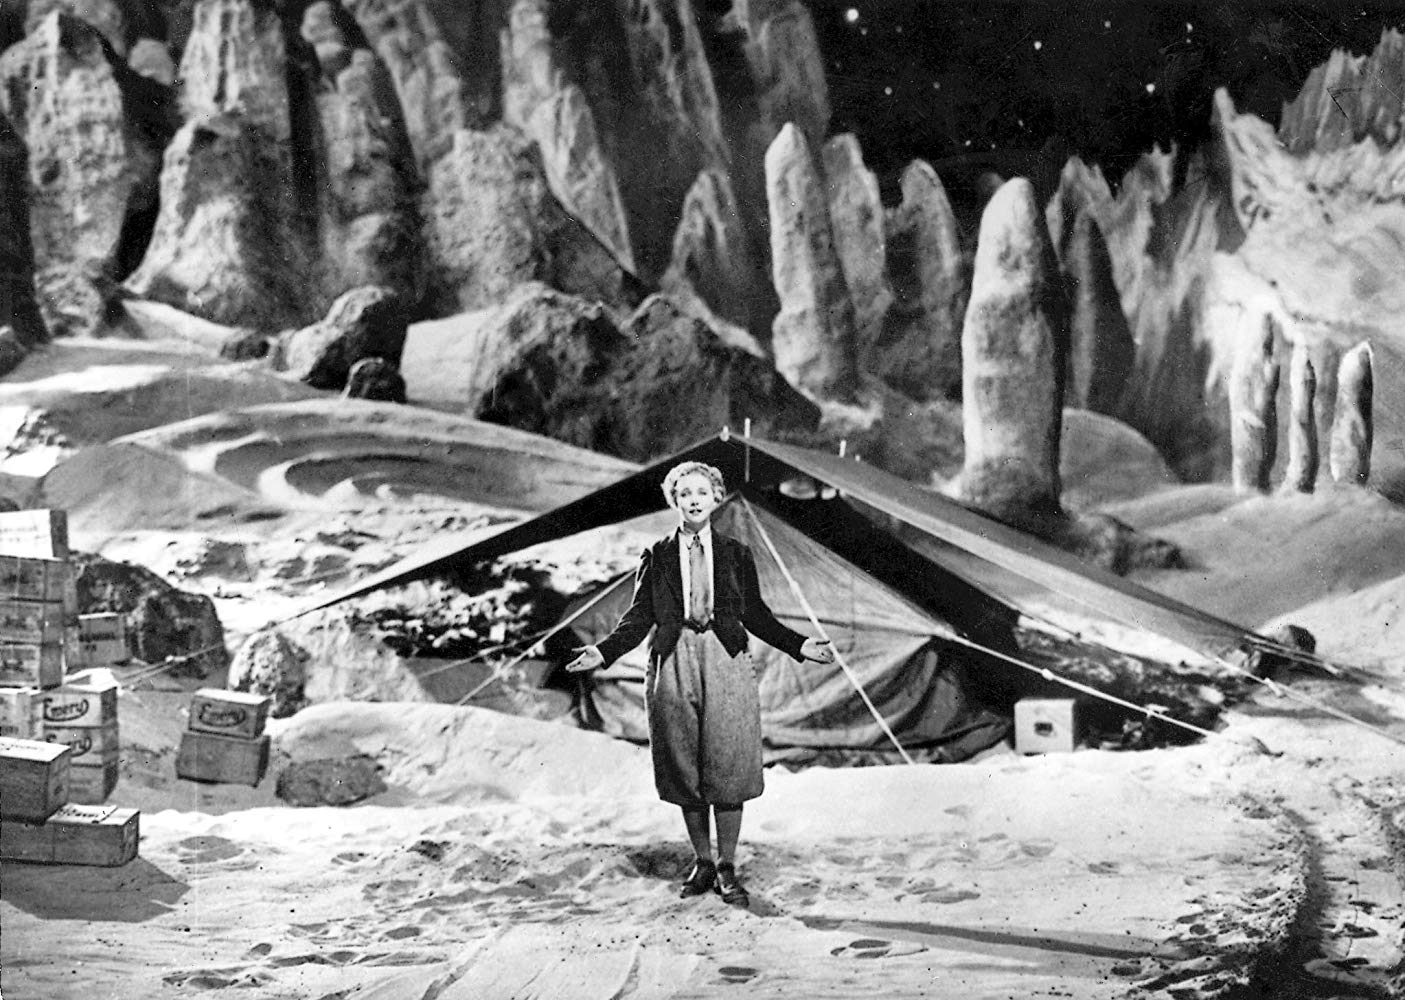 Gerda Marcus as Friede Velten, Woman in the Moon (1929)